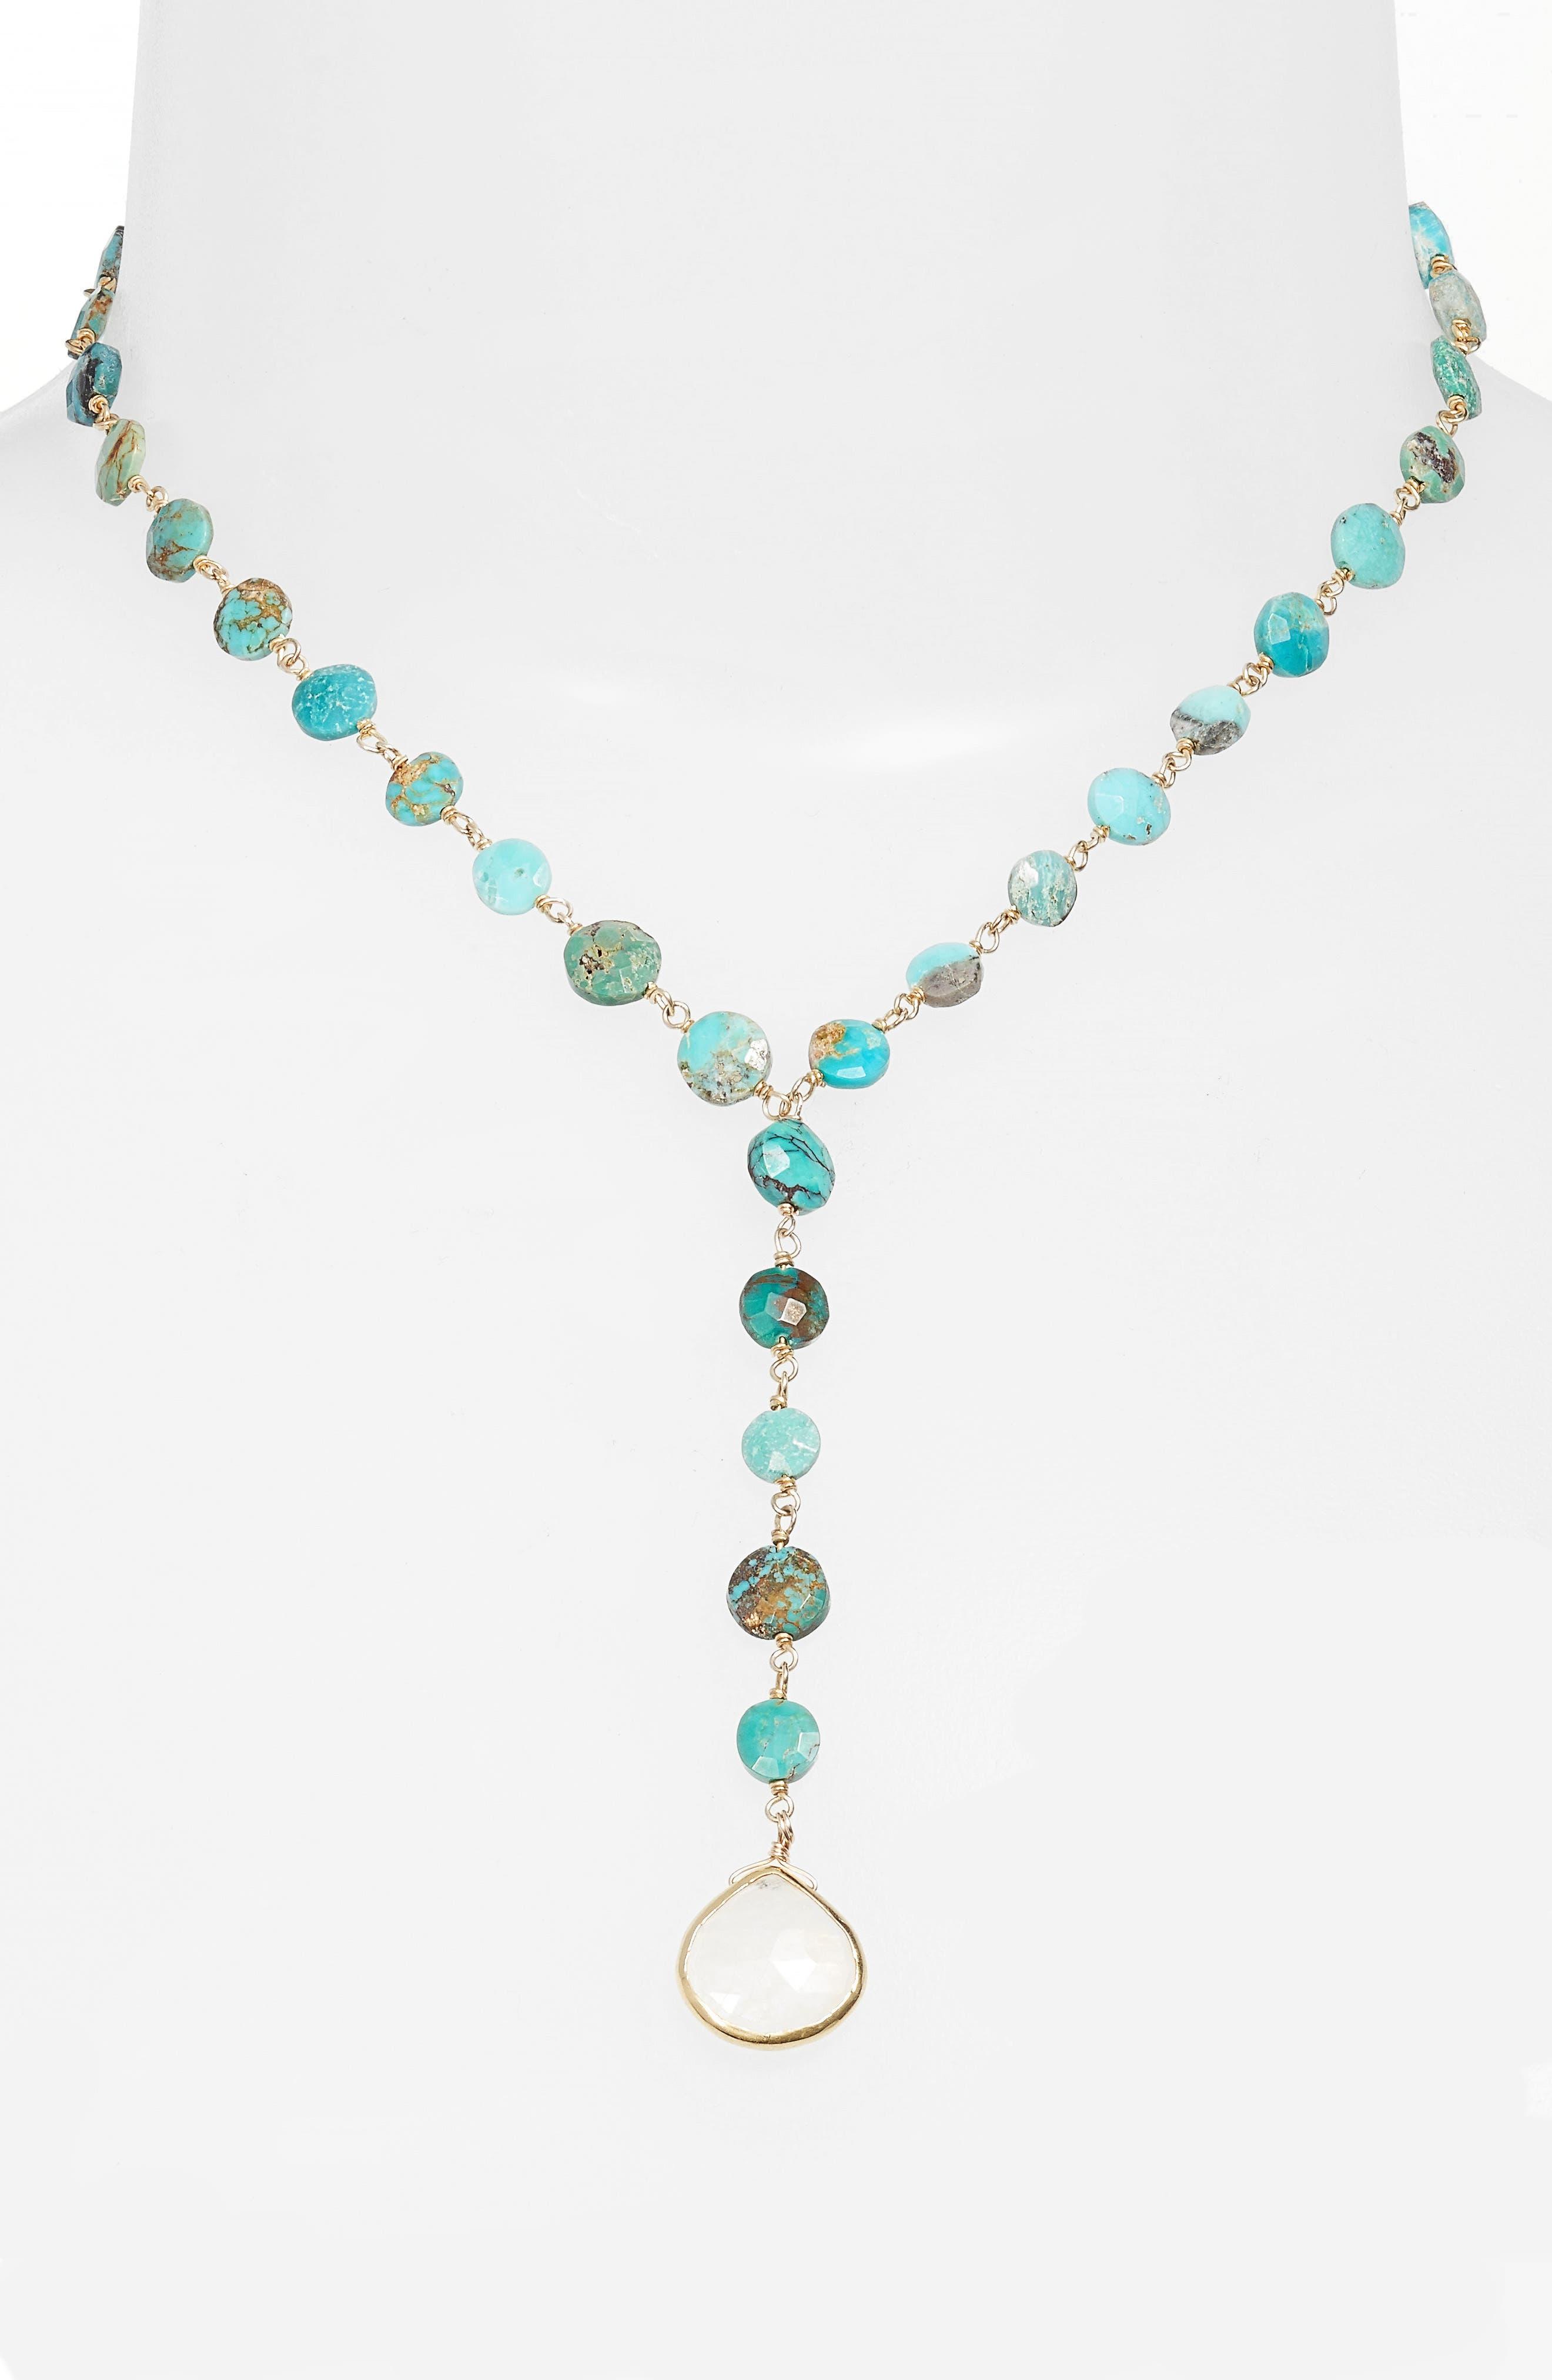 ela rae Yaeli Coin Necklace